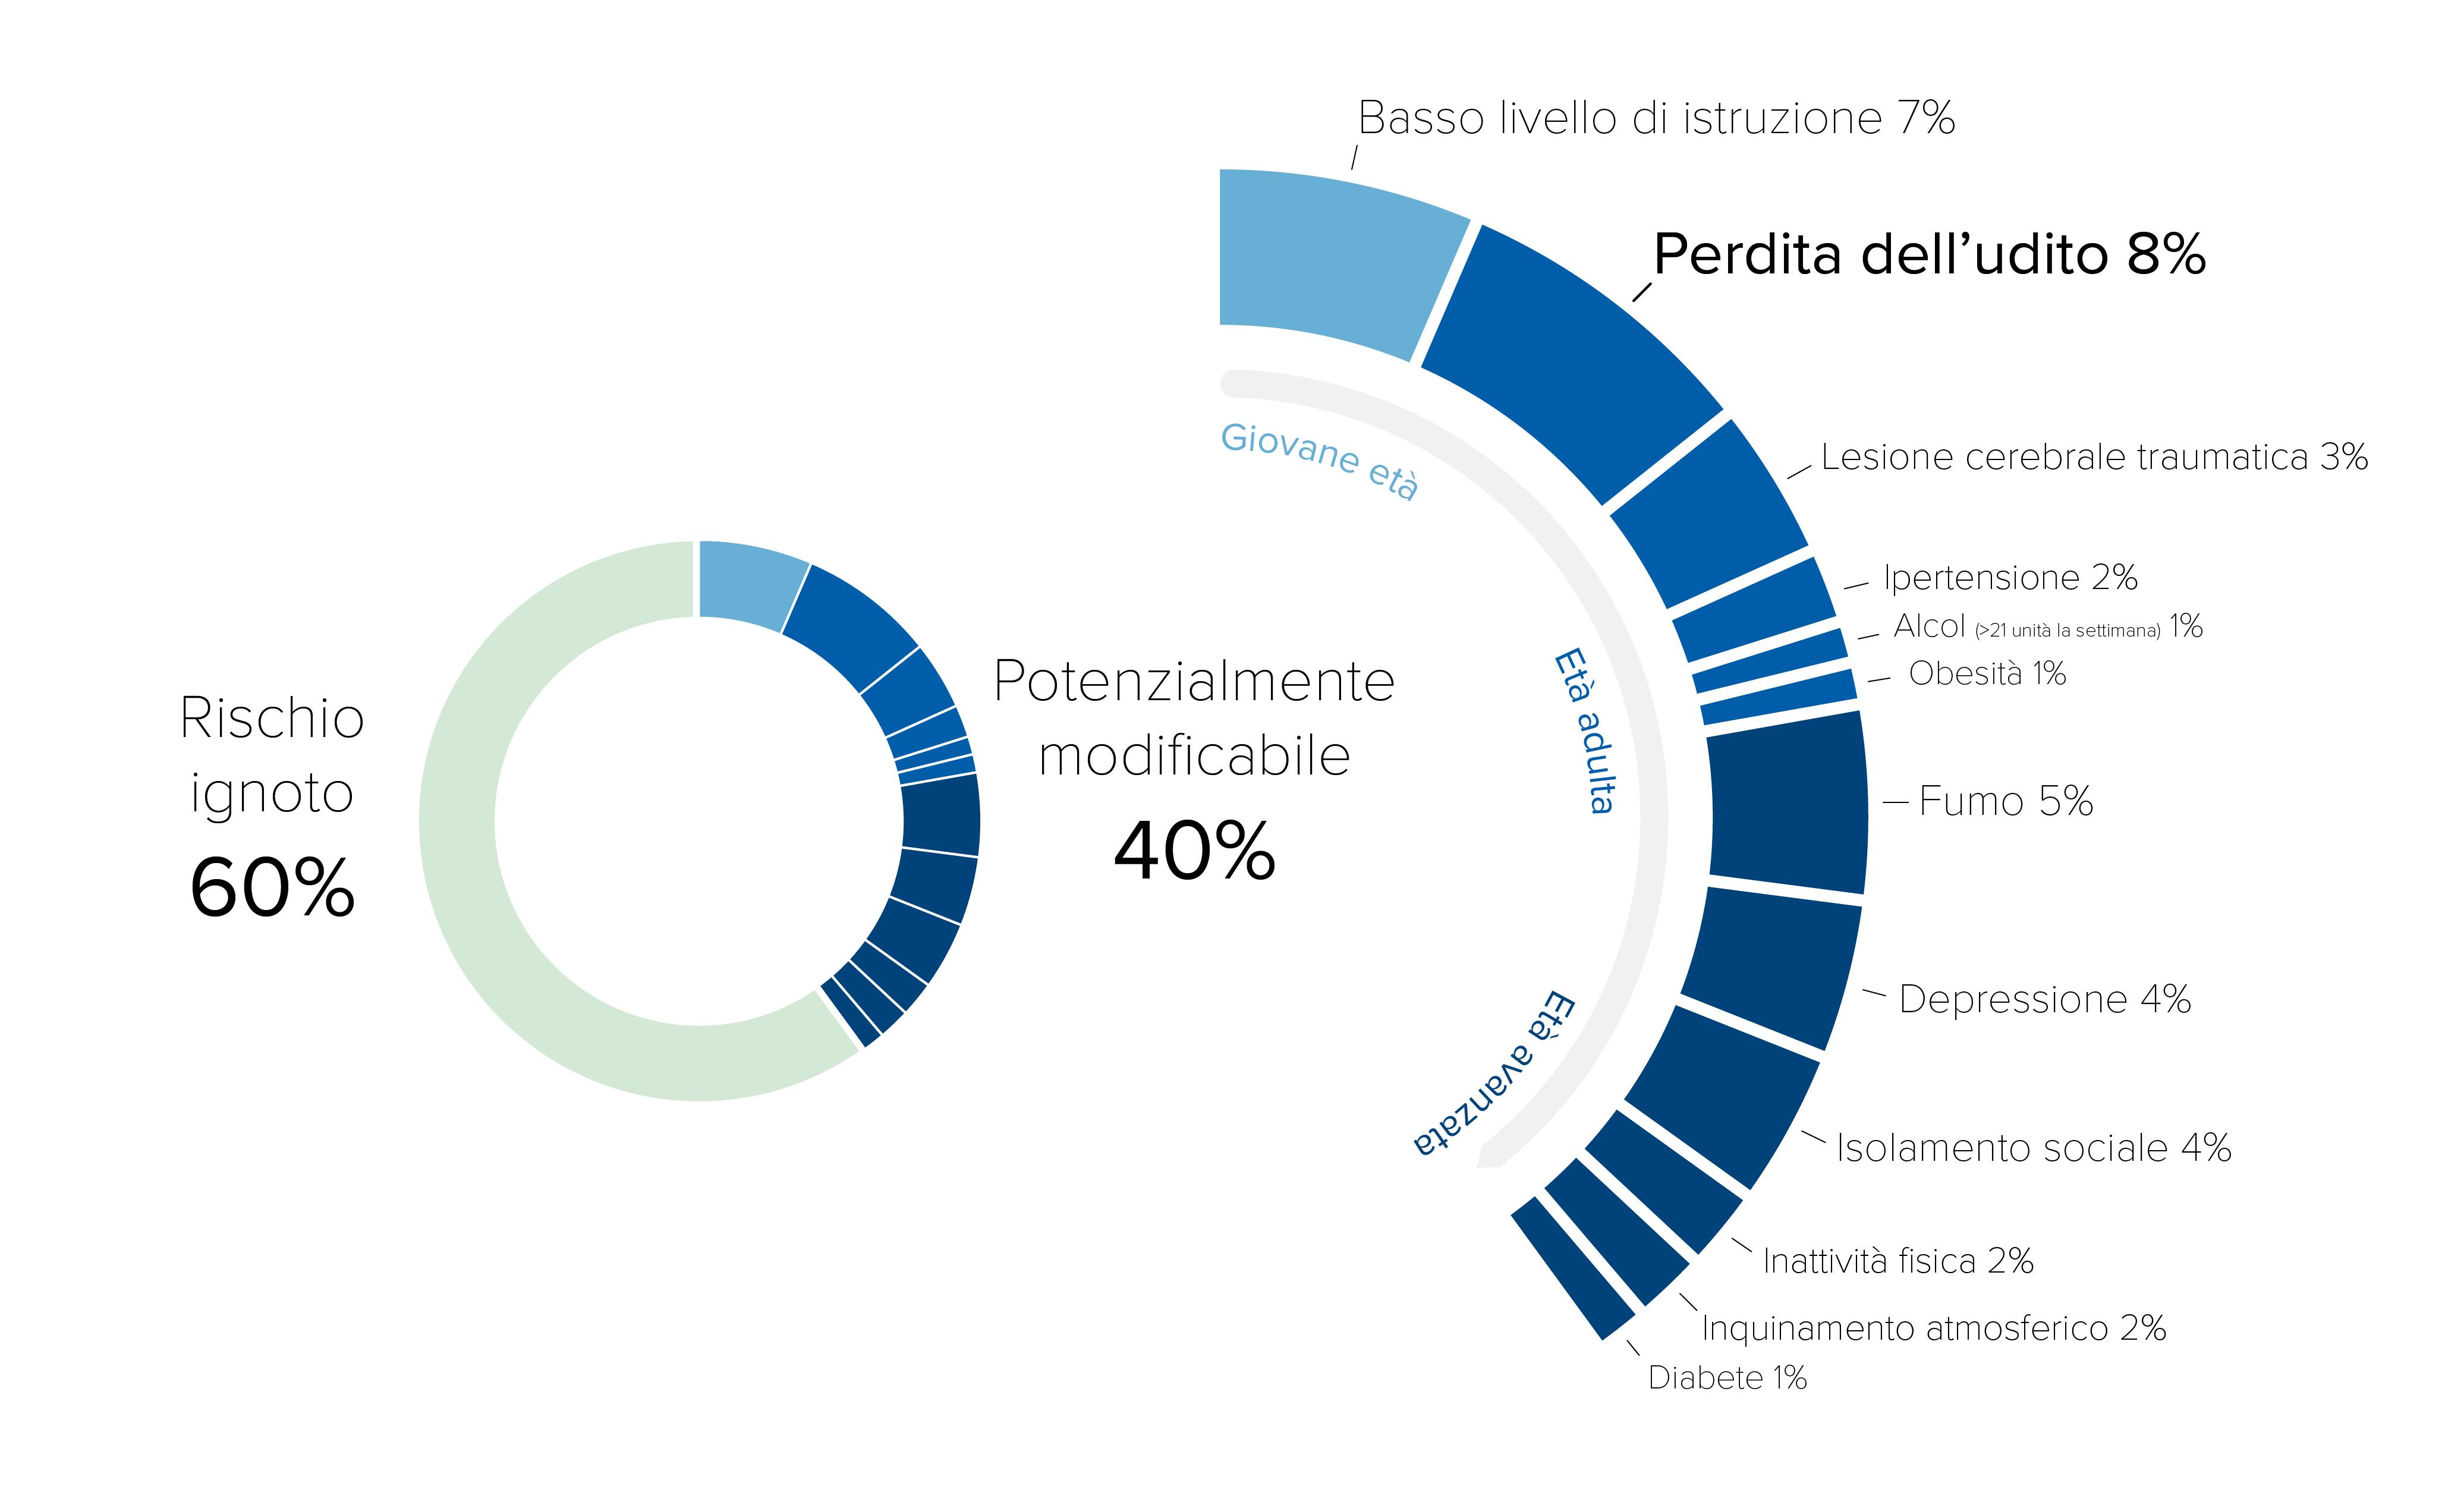 infographic_risk-factors_desktop_it